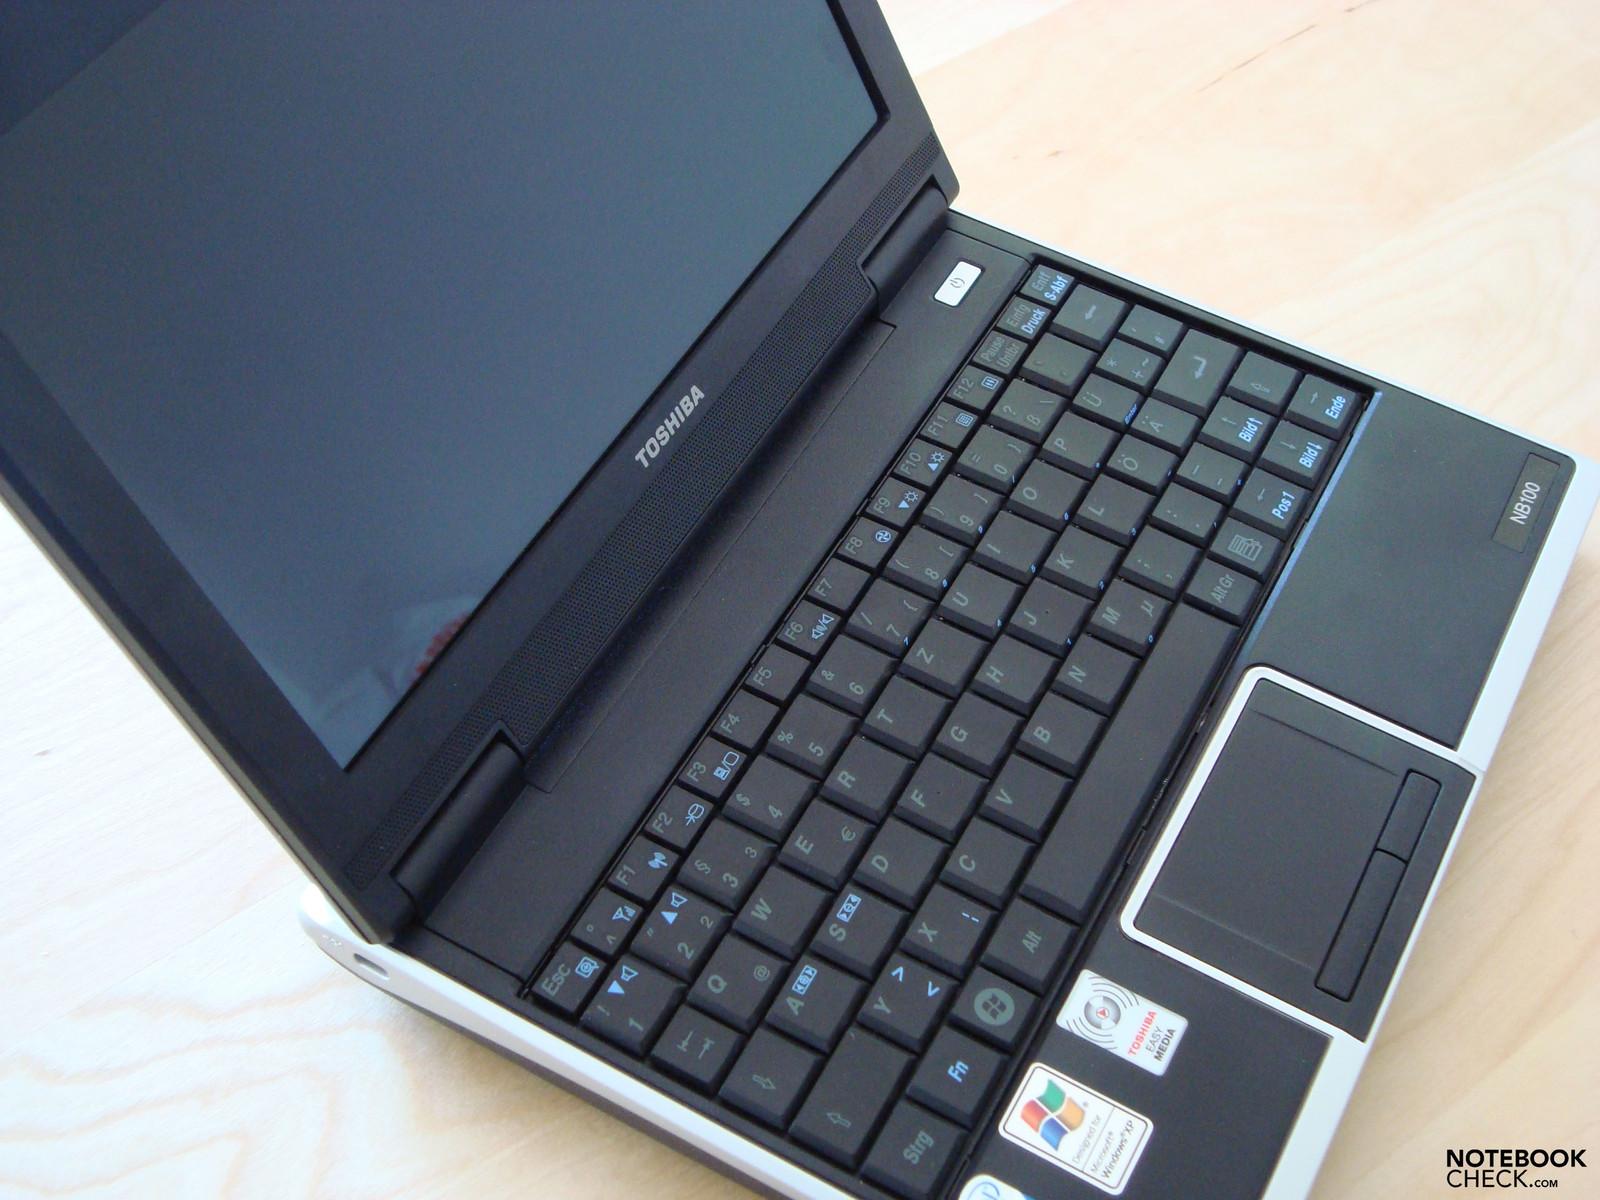 Toshiba NB100 laptop drivers for Windows 10 x64